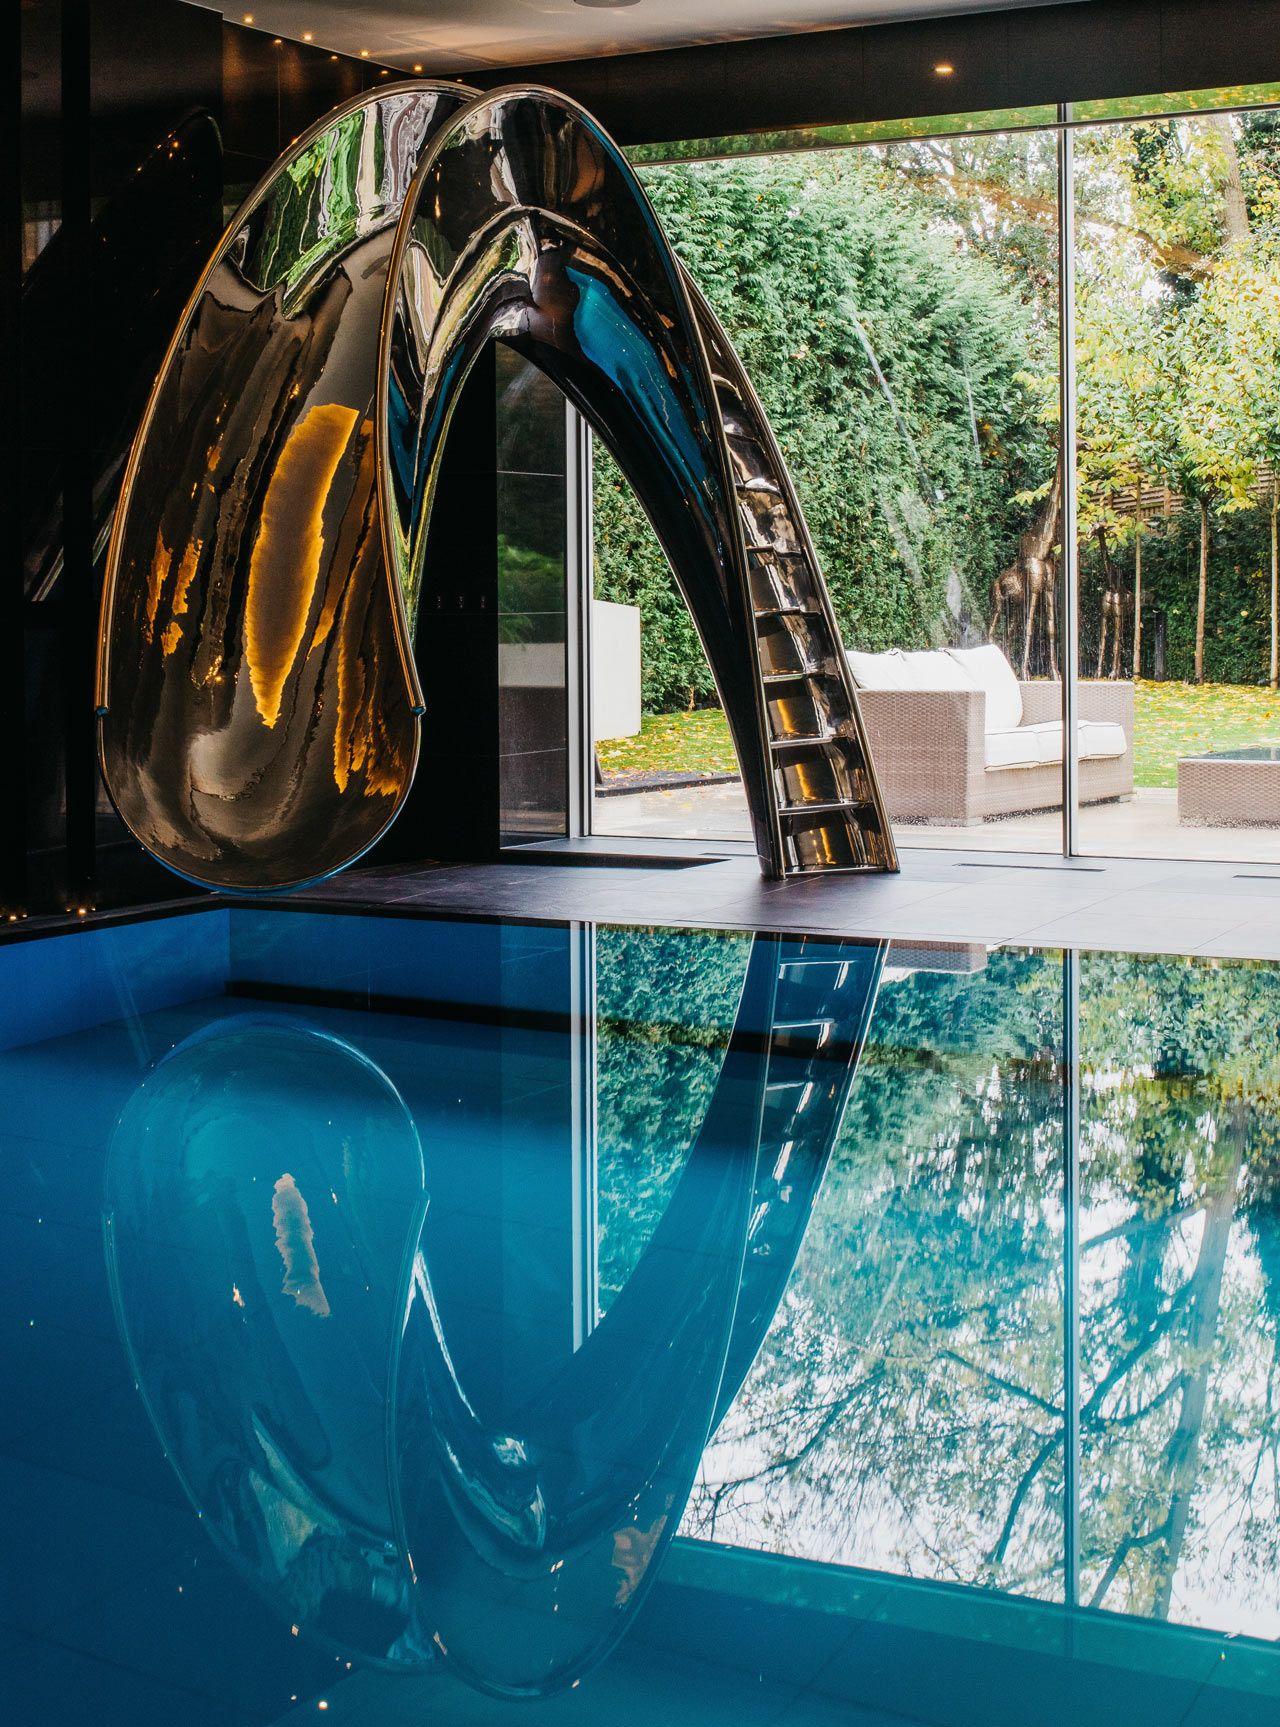 Sleek Sculptural Water Slides For The Modern Pool Indoor Pool Design Indoor Swimming Pool Design Indoor Pool House